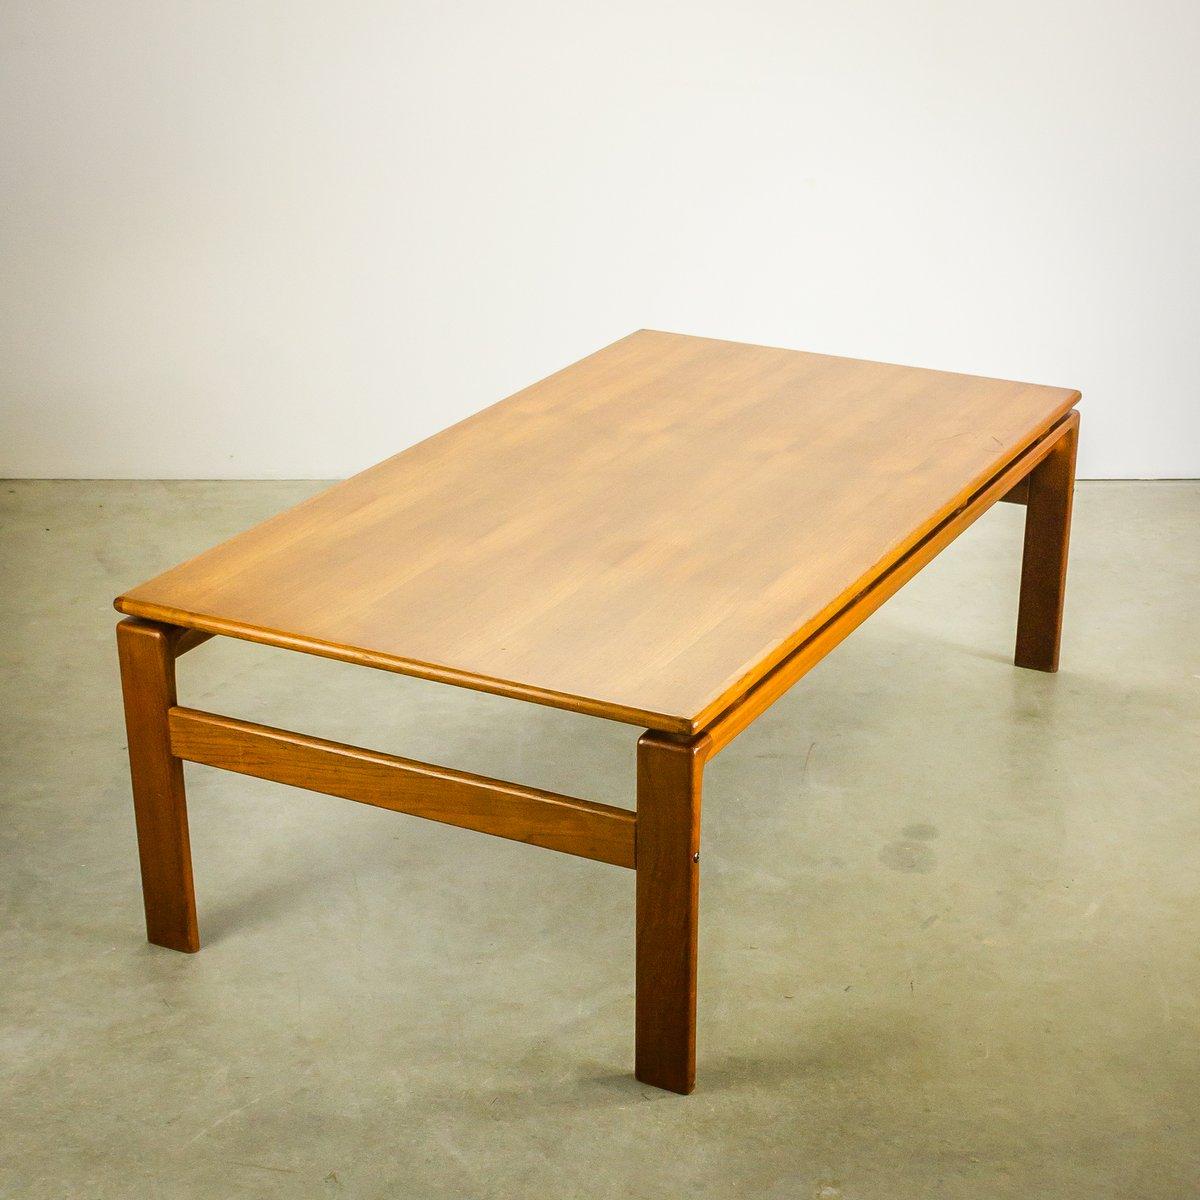 Attractive Danish Teak Coffee Table From Komfort, 1970s